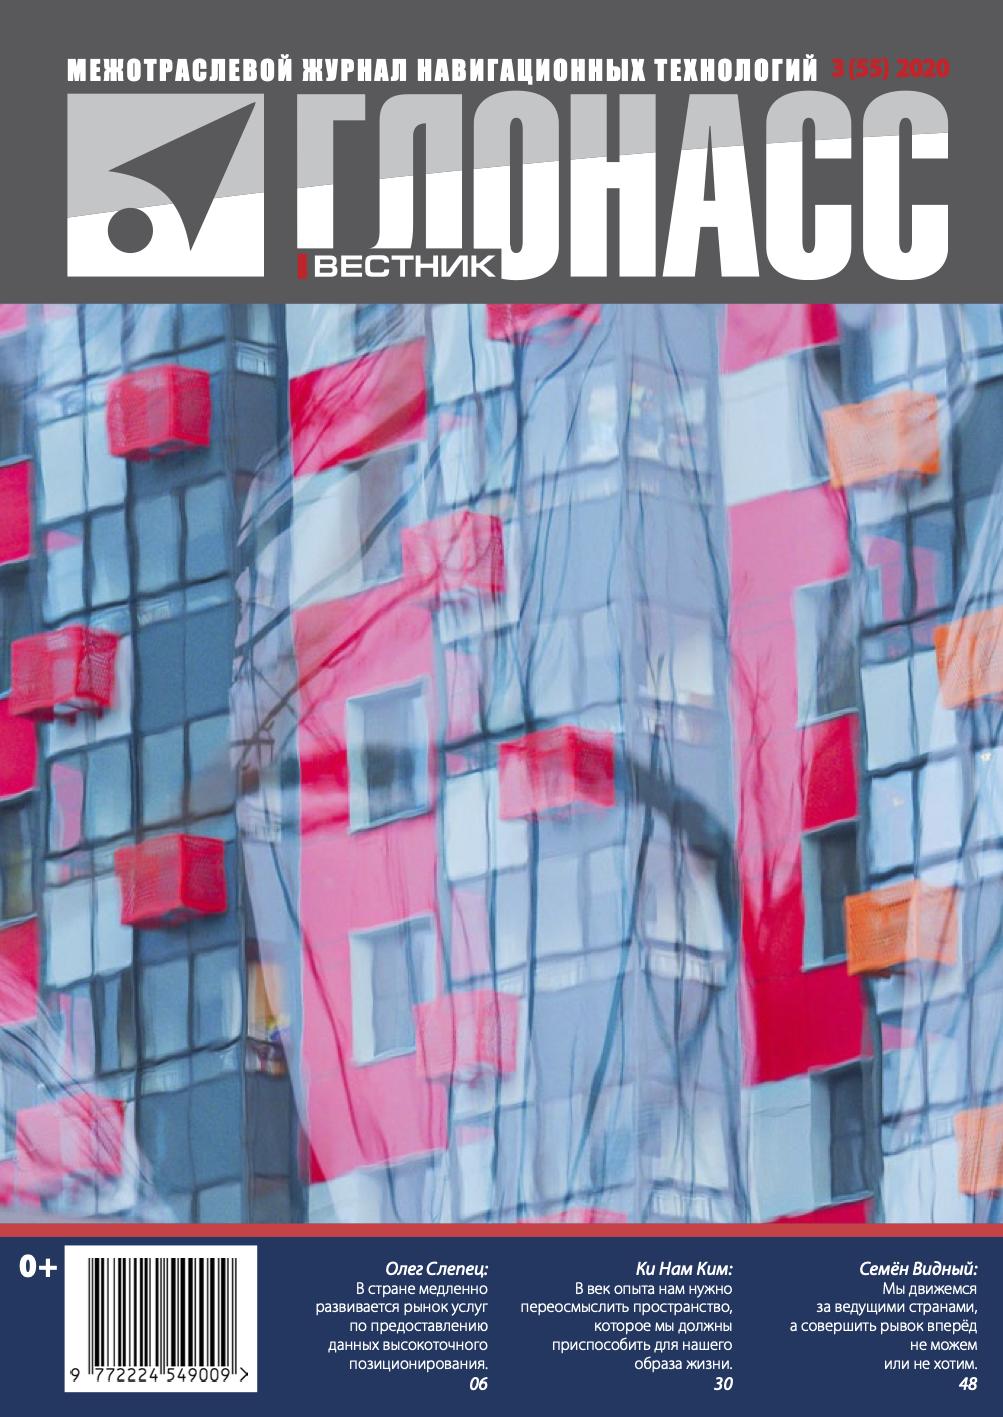 Вестник ГЛОНАСС | #03-2020 | в электронном виде (PDF)